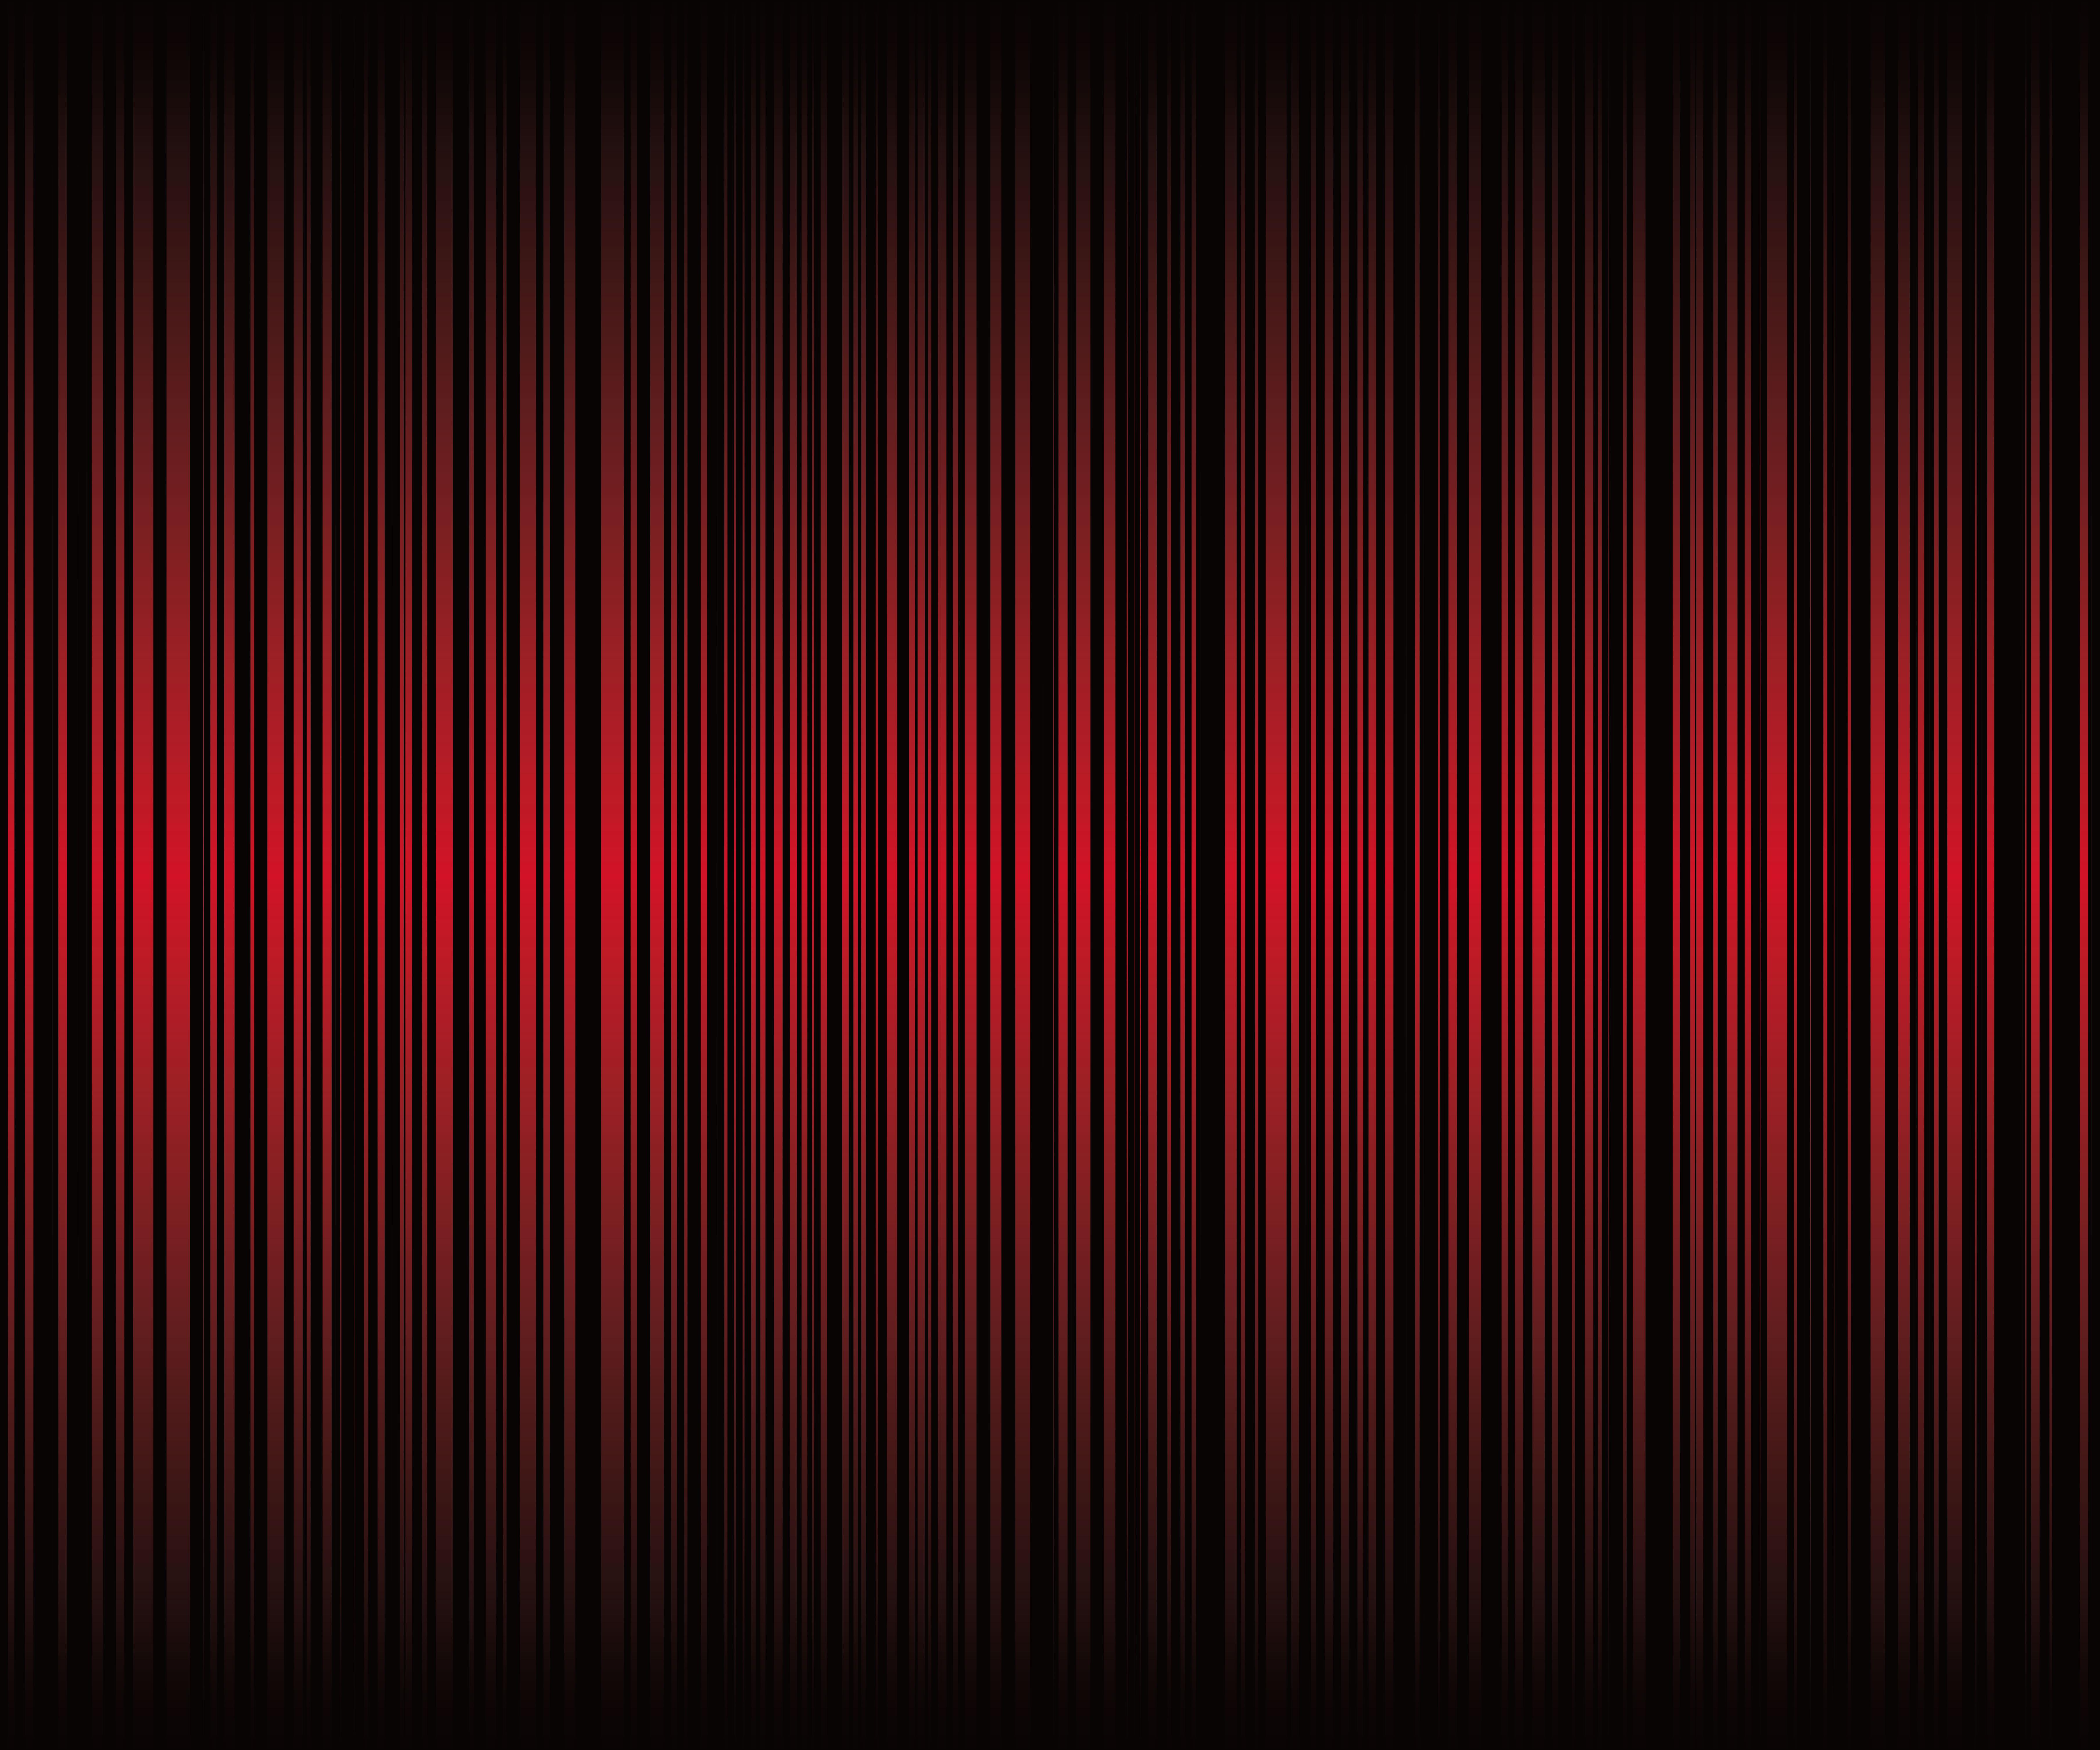 Atmospheric Vertical Stripes Vector Background, Red, Black ...